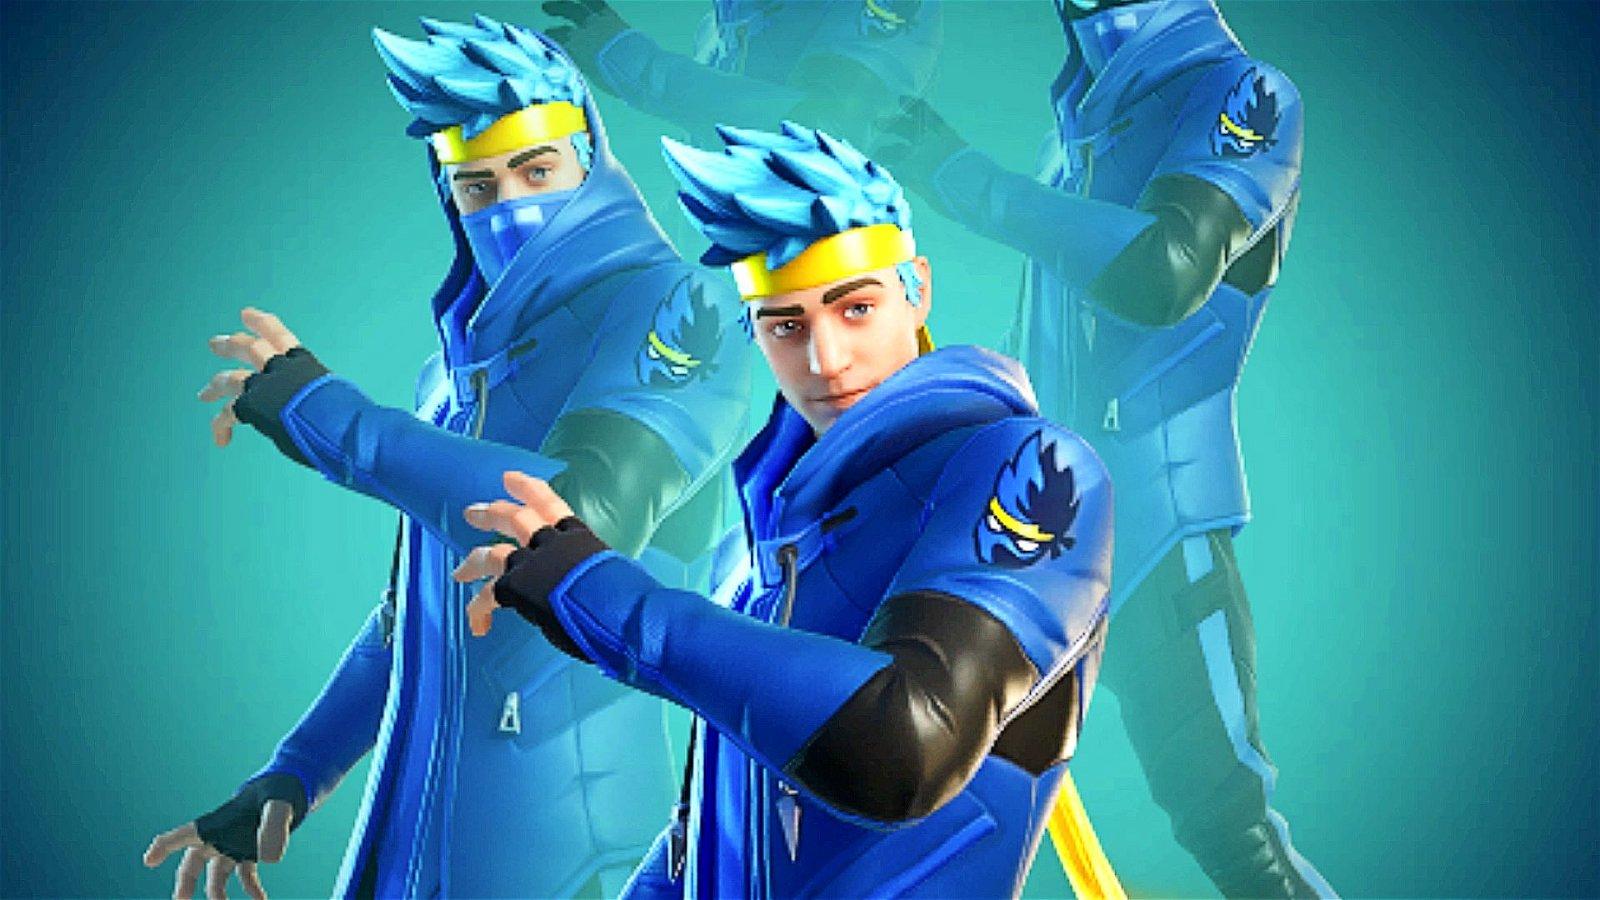 Ninja Makes First Fortnite Stream on YouTube Gaming